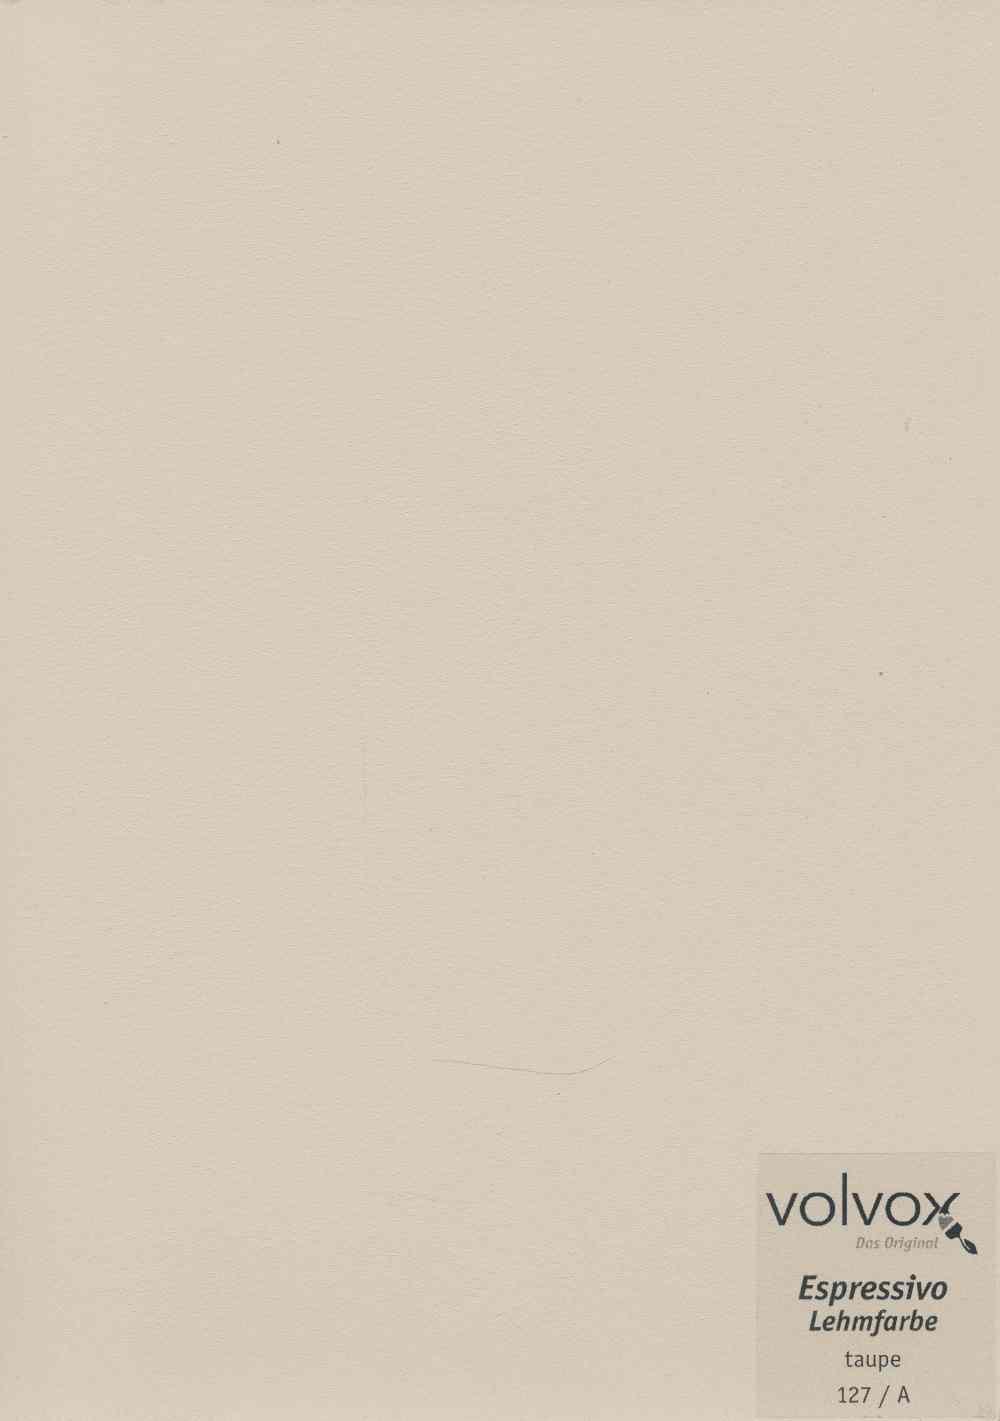 Volvox Espressivo Lehmfarbe 127 taupe